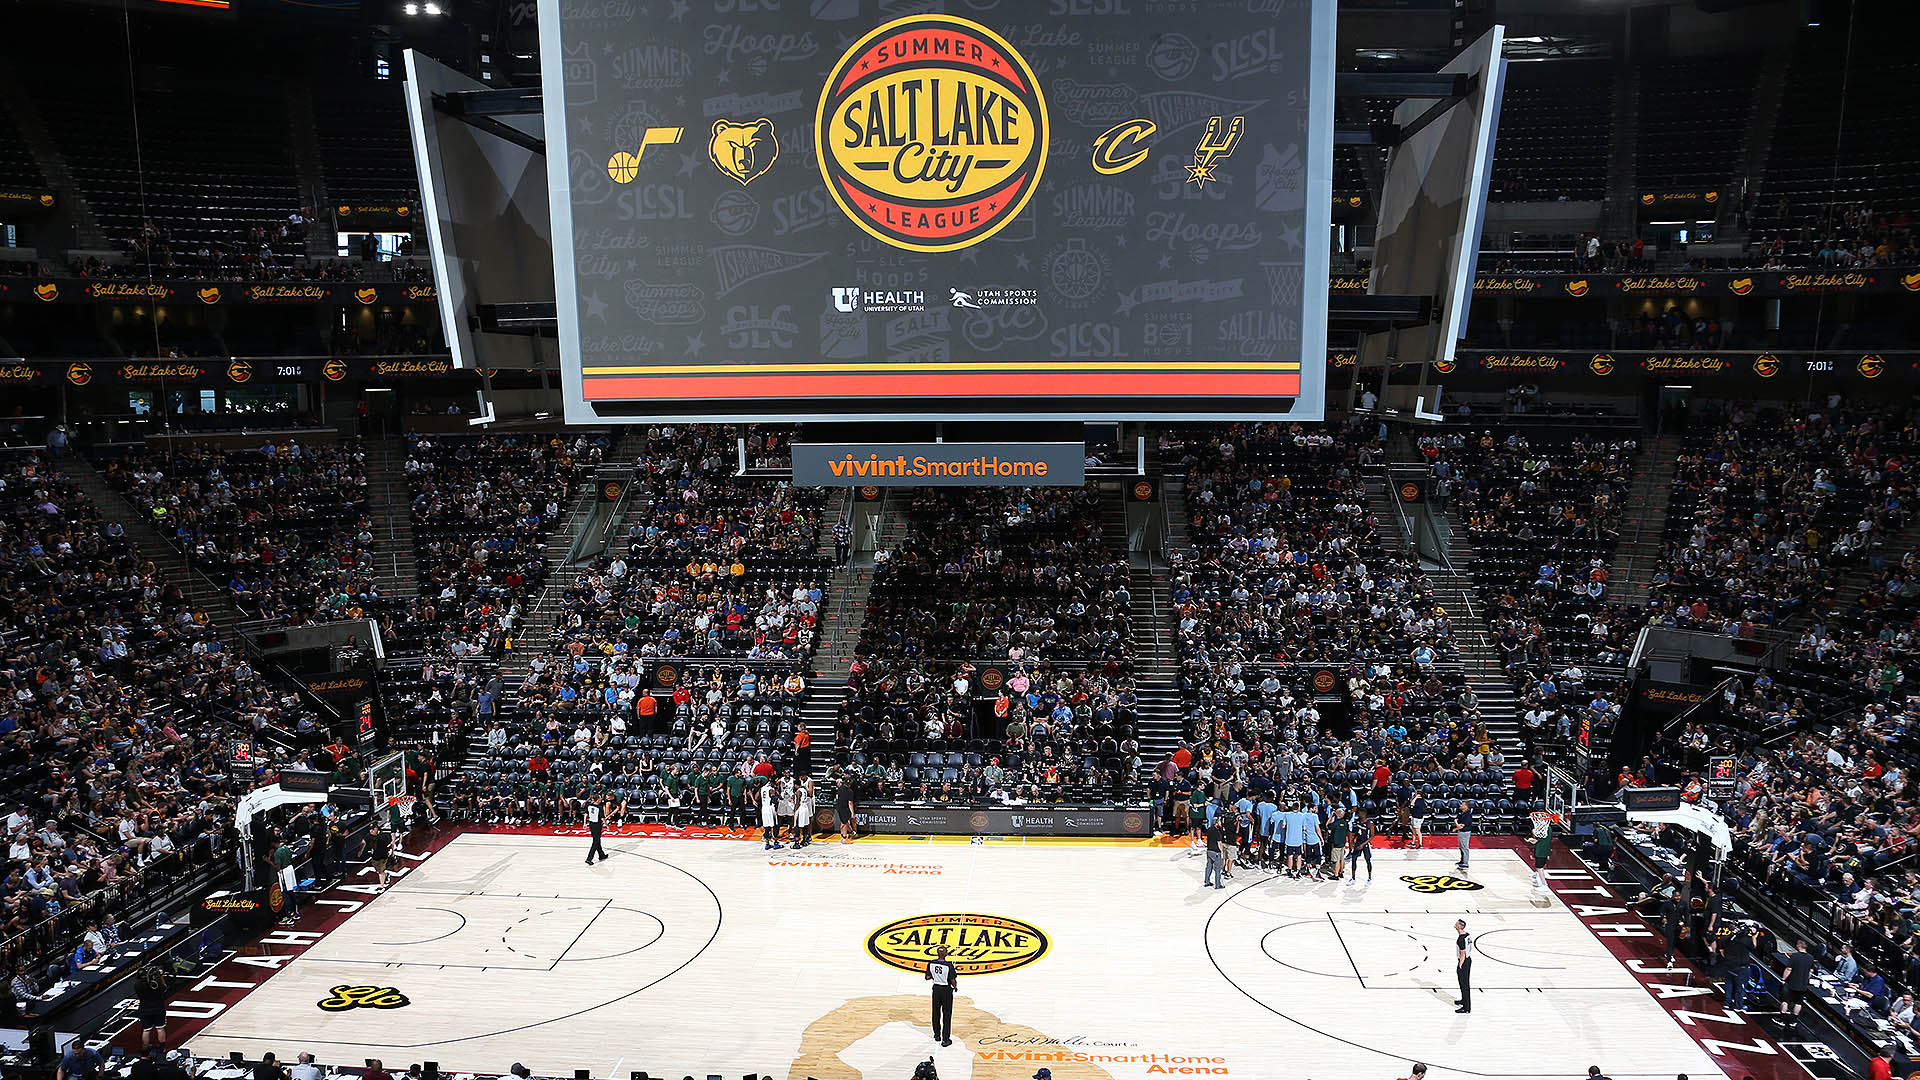 Salt Lake City Summer League tips off Aug. 3